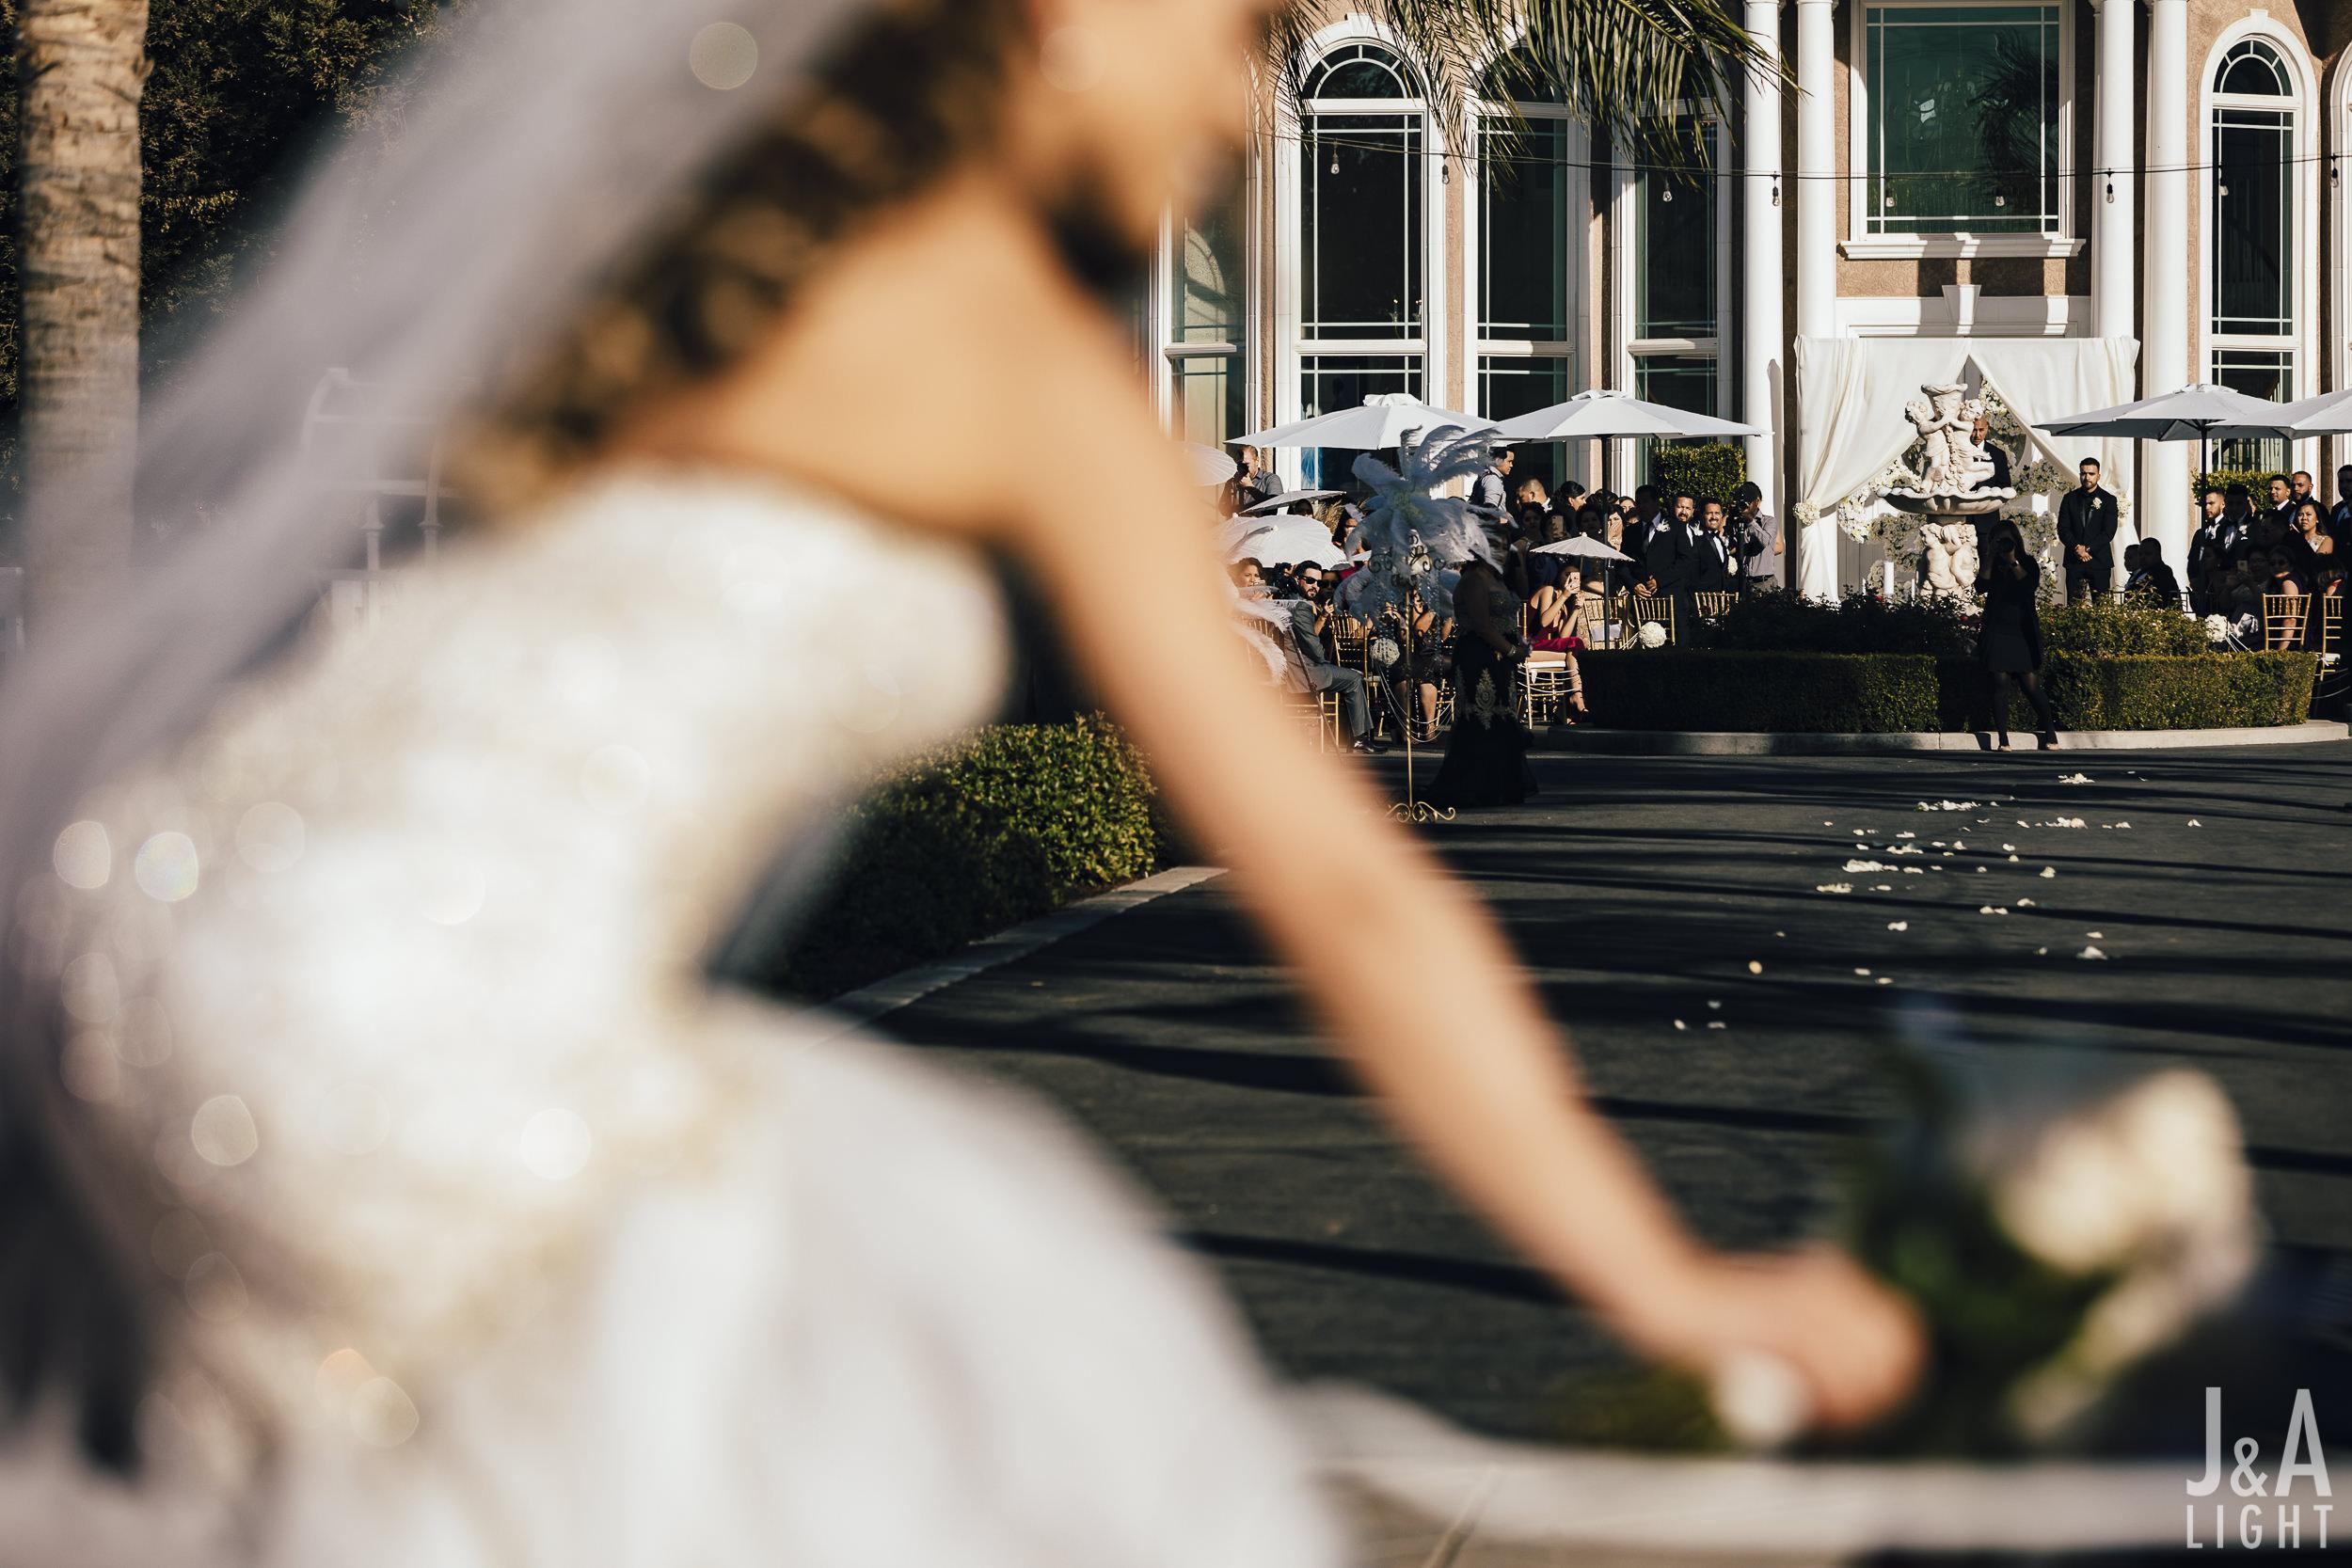 20171014-JanDan-LosBanos-GlassMansion-Wedding-Blog-031.jpg